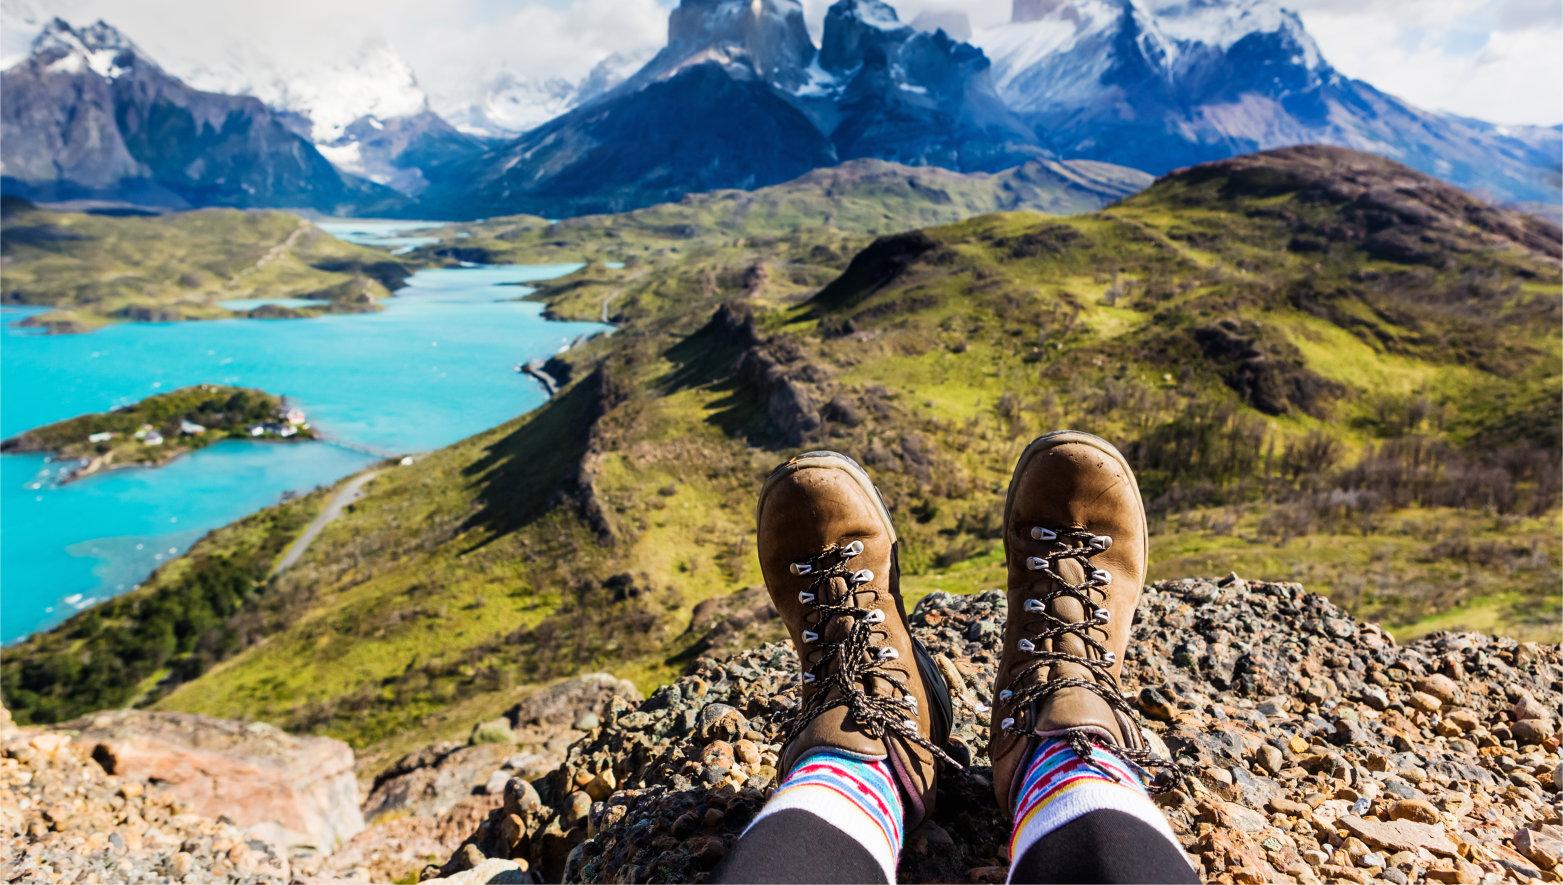 Girl,Hiking,Boots,Having,Fun,And,Enjoying,Wonderful,Breathtaking,Mountain